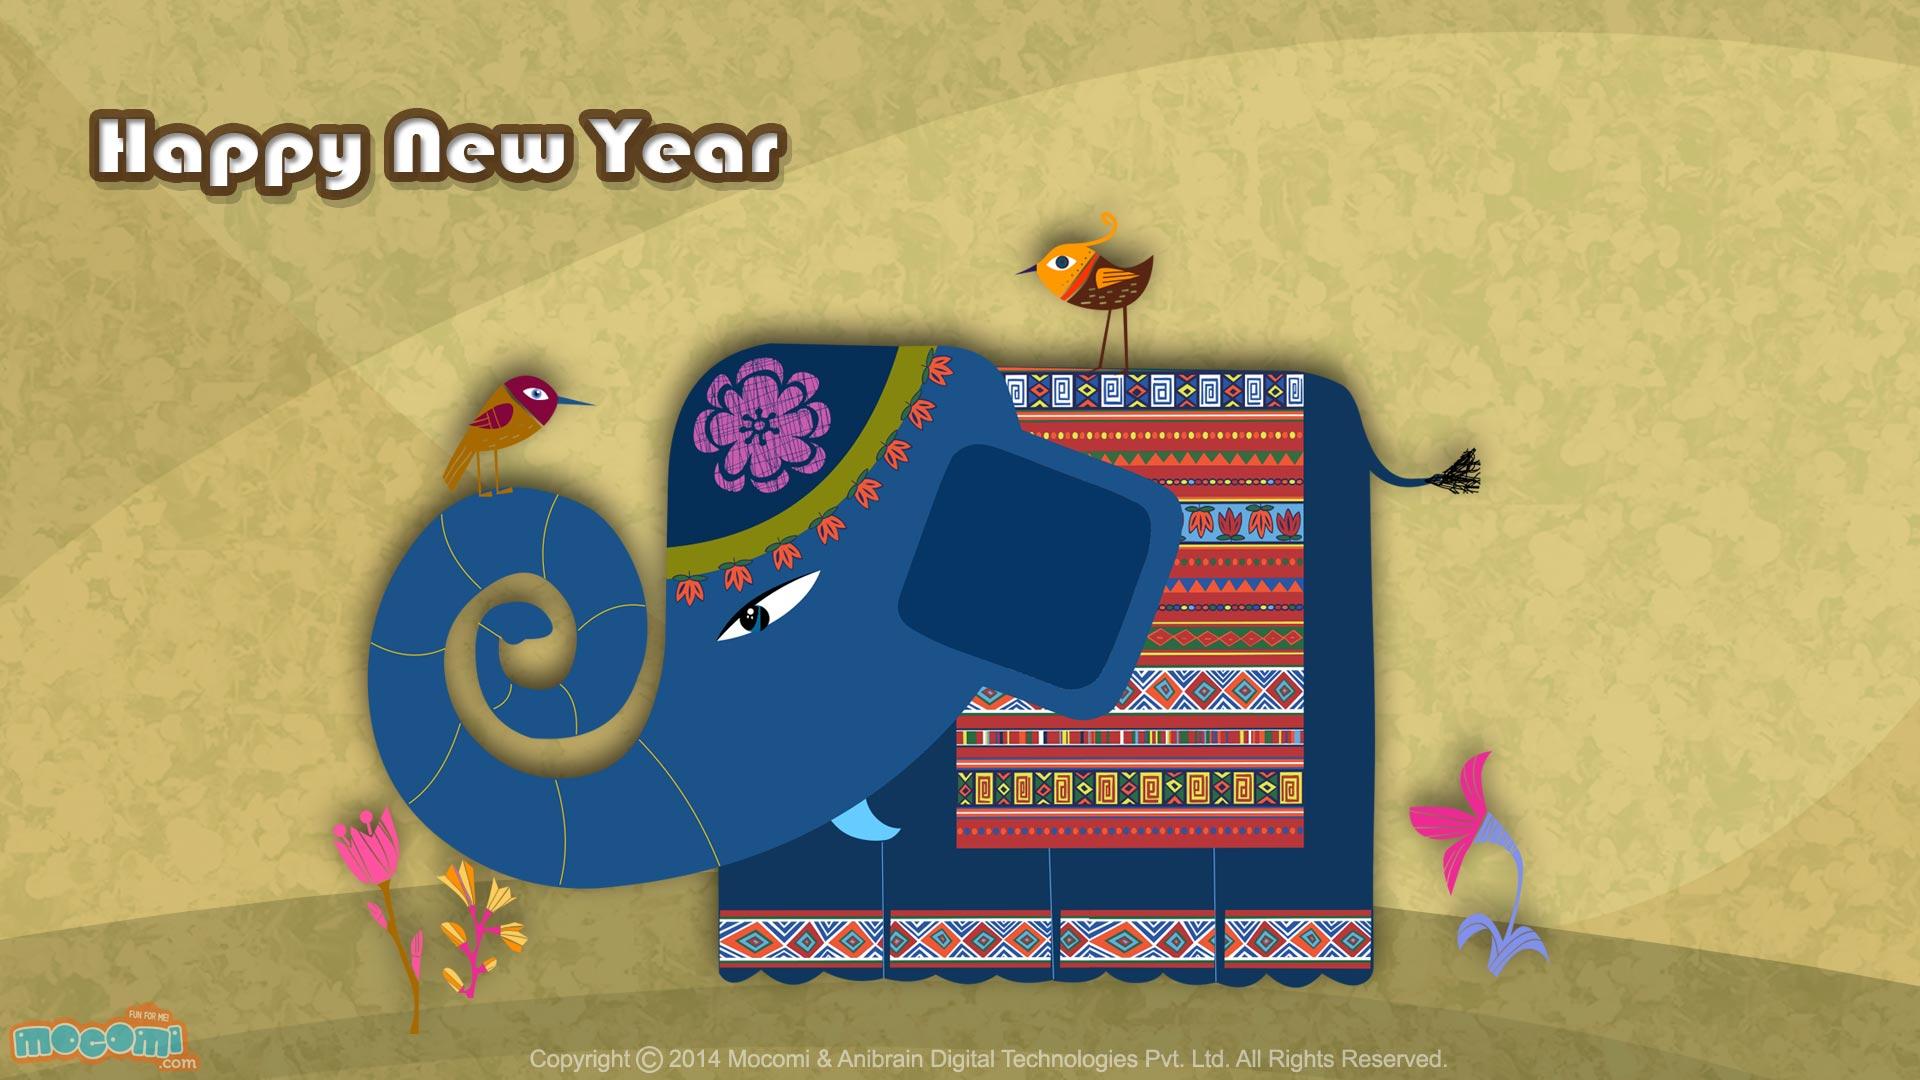 Happy New Year Wallpaper- 15